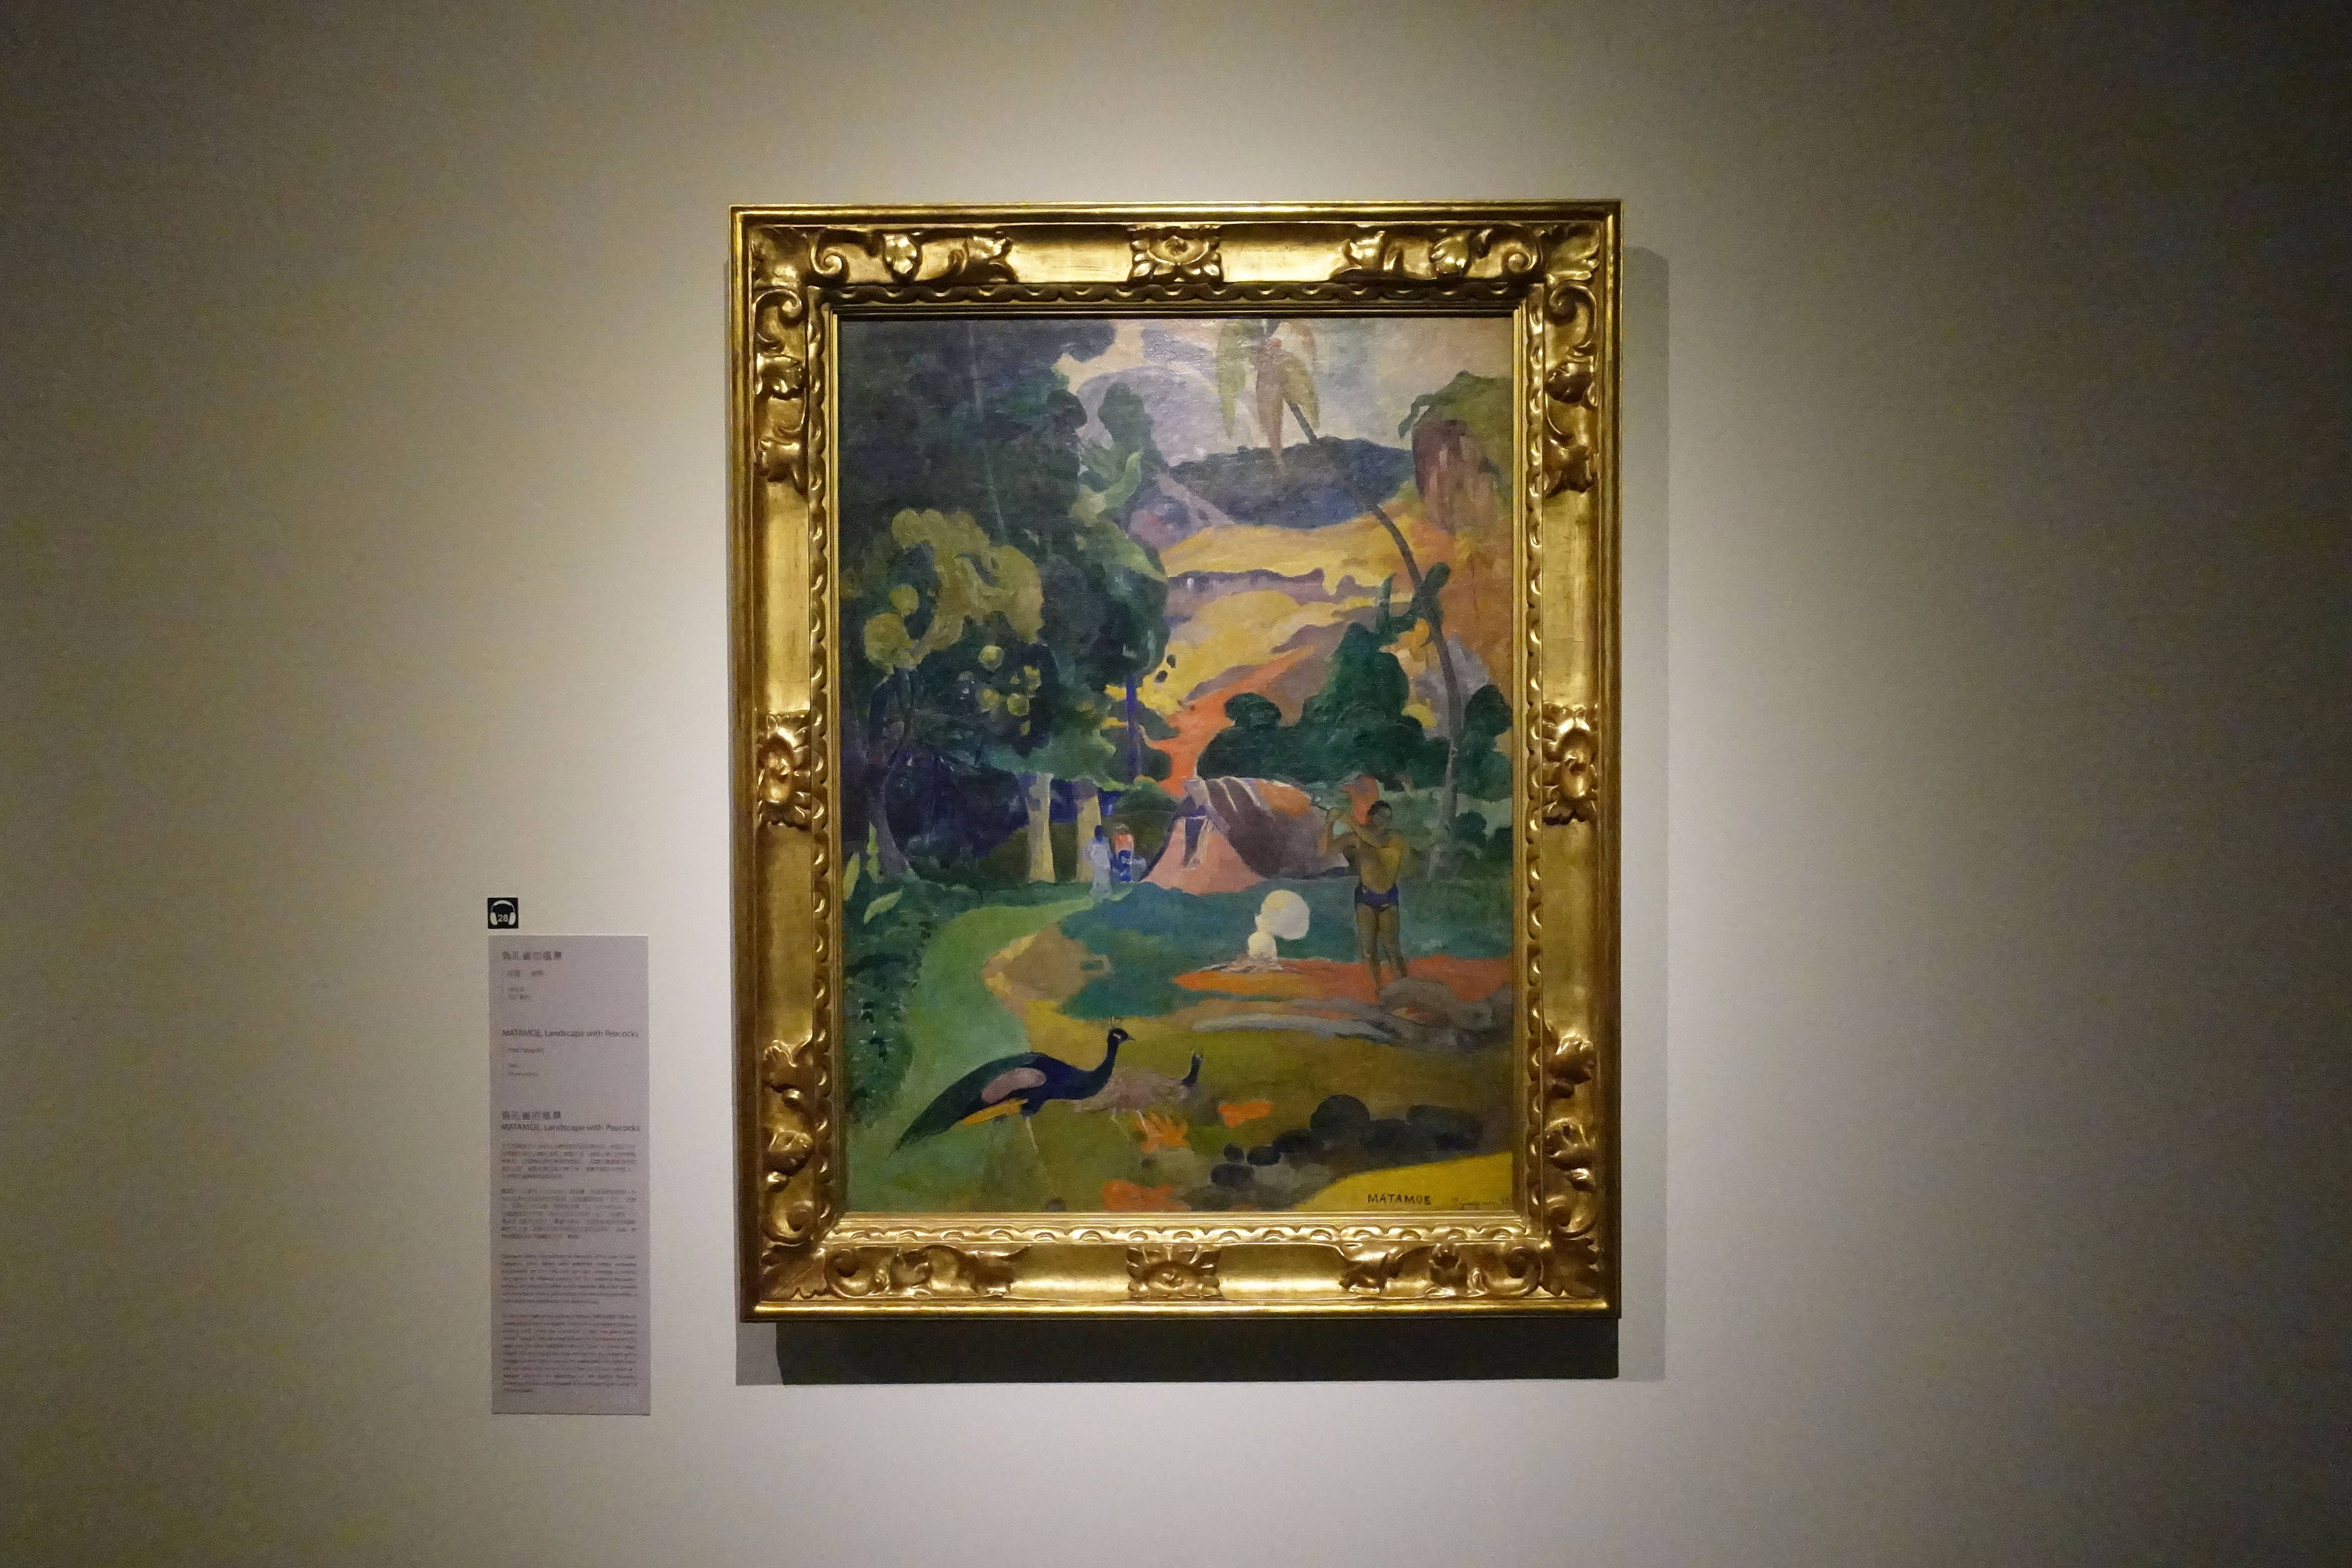 保羅.高更 Paul Gauguin ,《有孔雀的風景 MATAMOE, Landscape with Peacocks》,油彩、畫布 Oil on canvas。